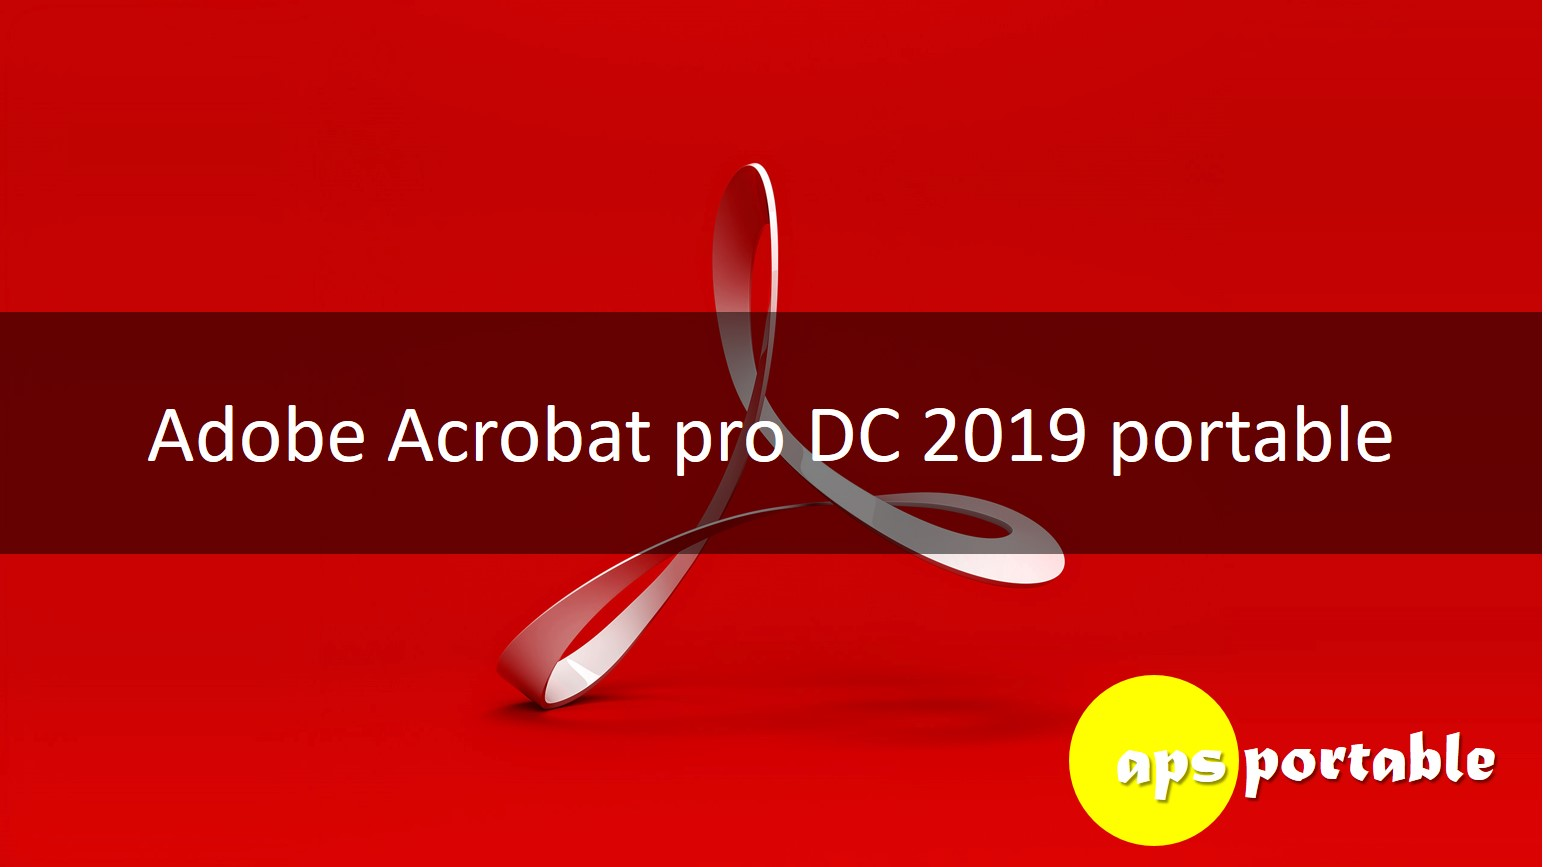 Adobe Acrobat pro DC 2019 portable v19.01